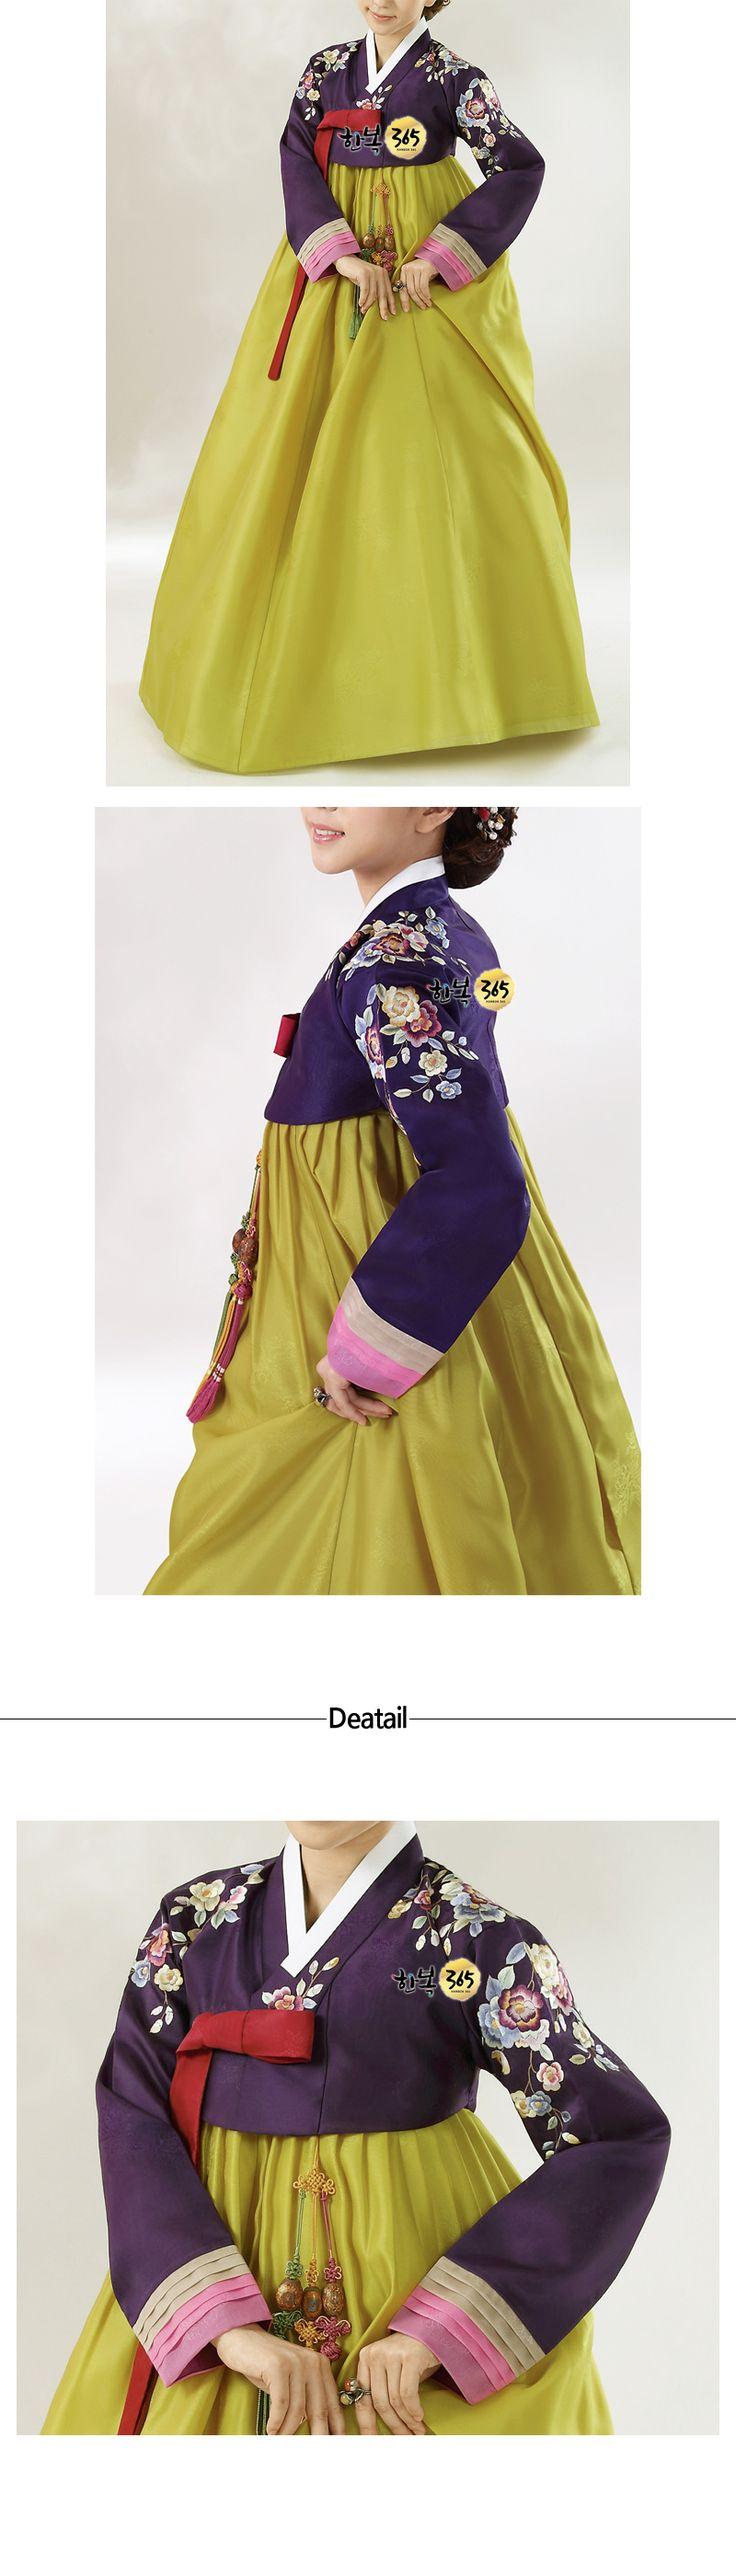 Hanbok-Korean traditional clothes, modernized hanbok for women